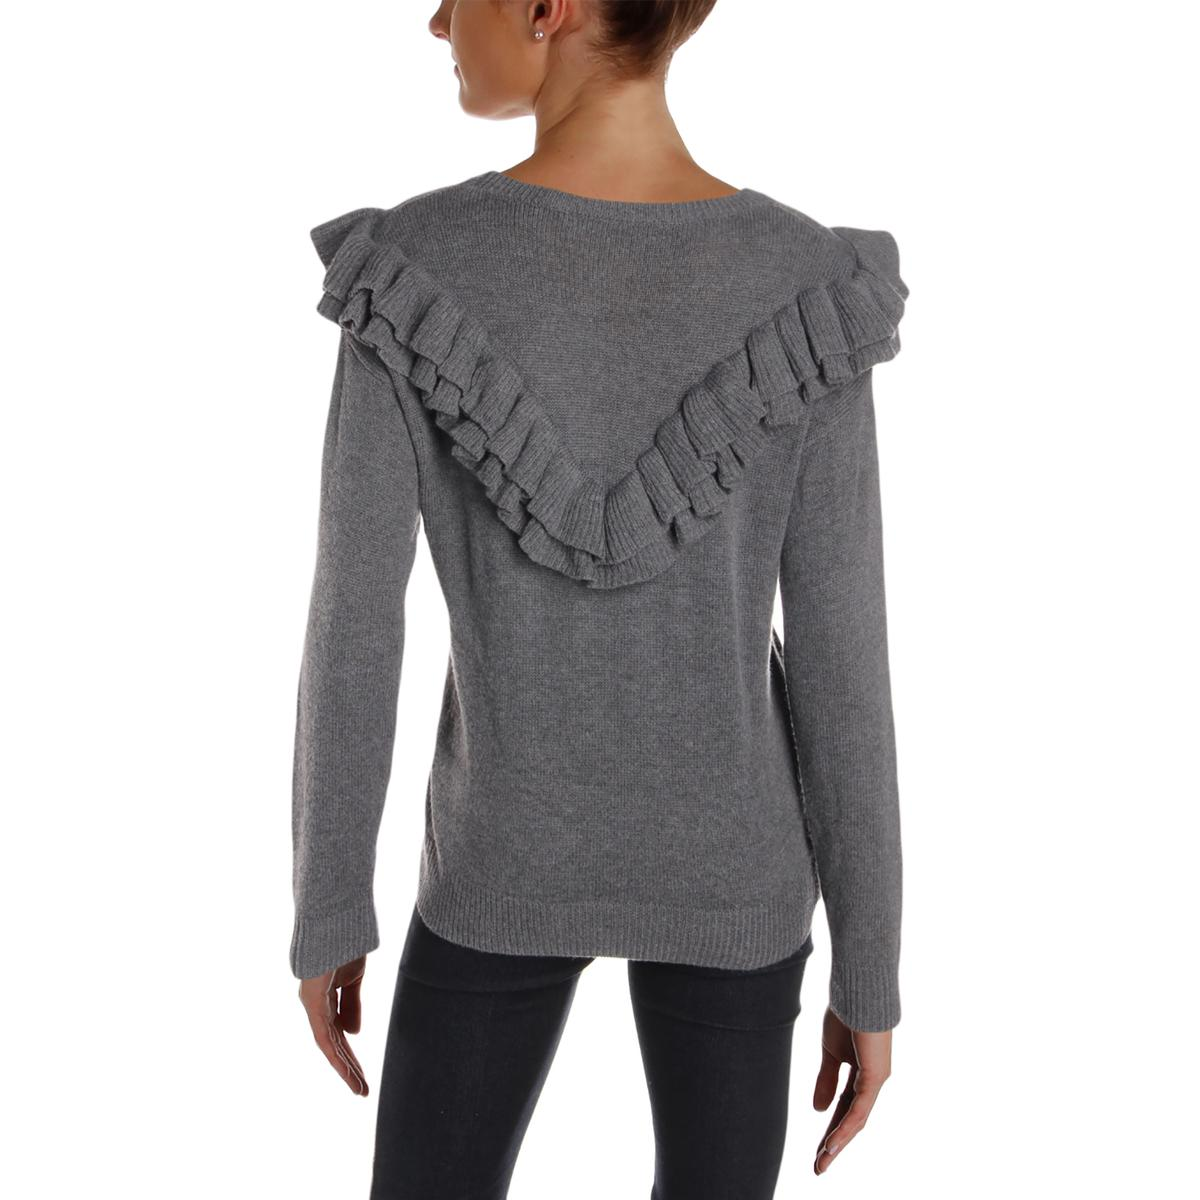 One Grey Day Women/'s Wool Blend Ruffled Long Sleeve Crew Neck Sweater